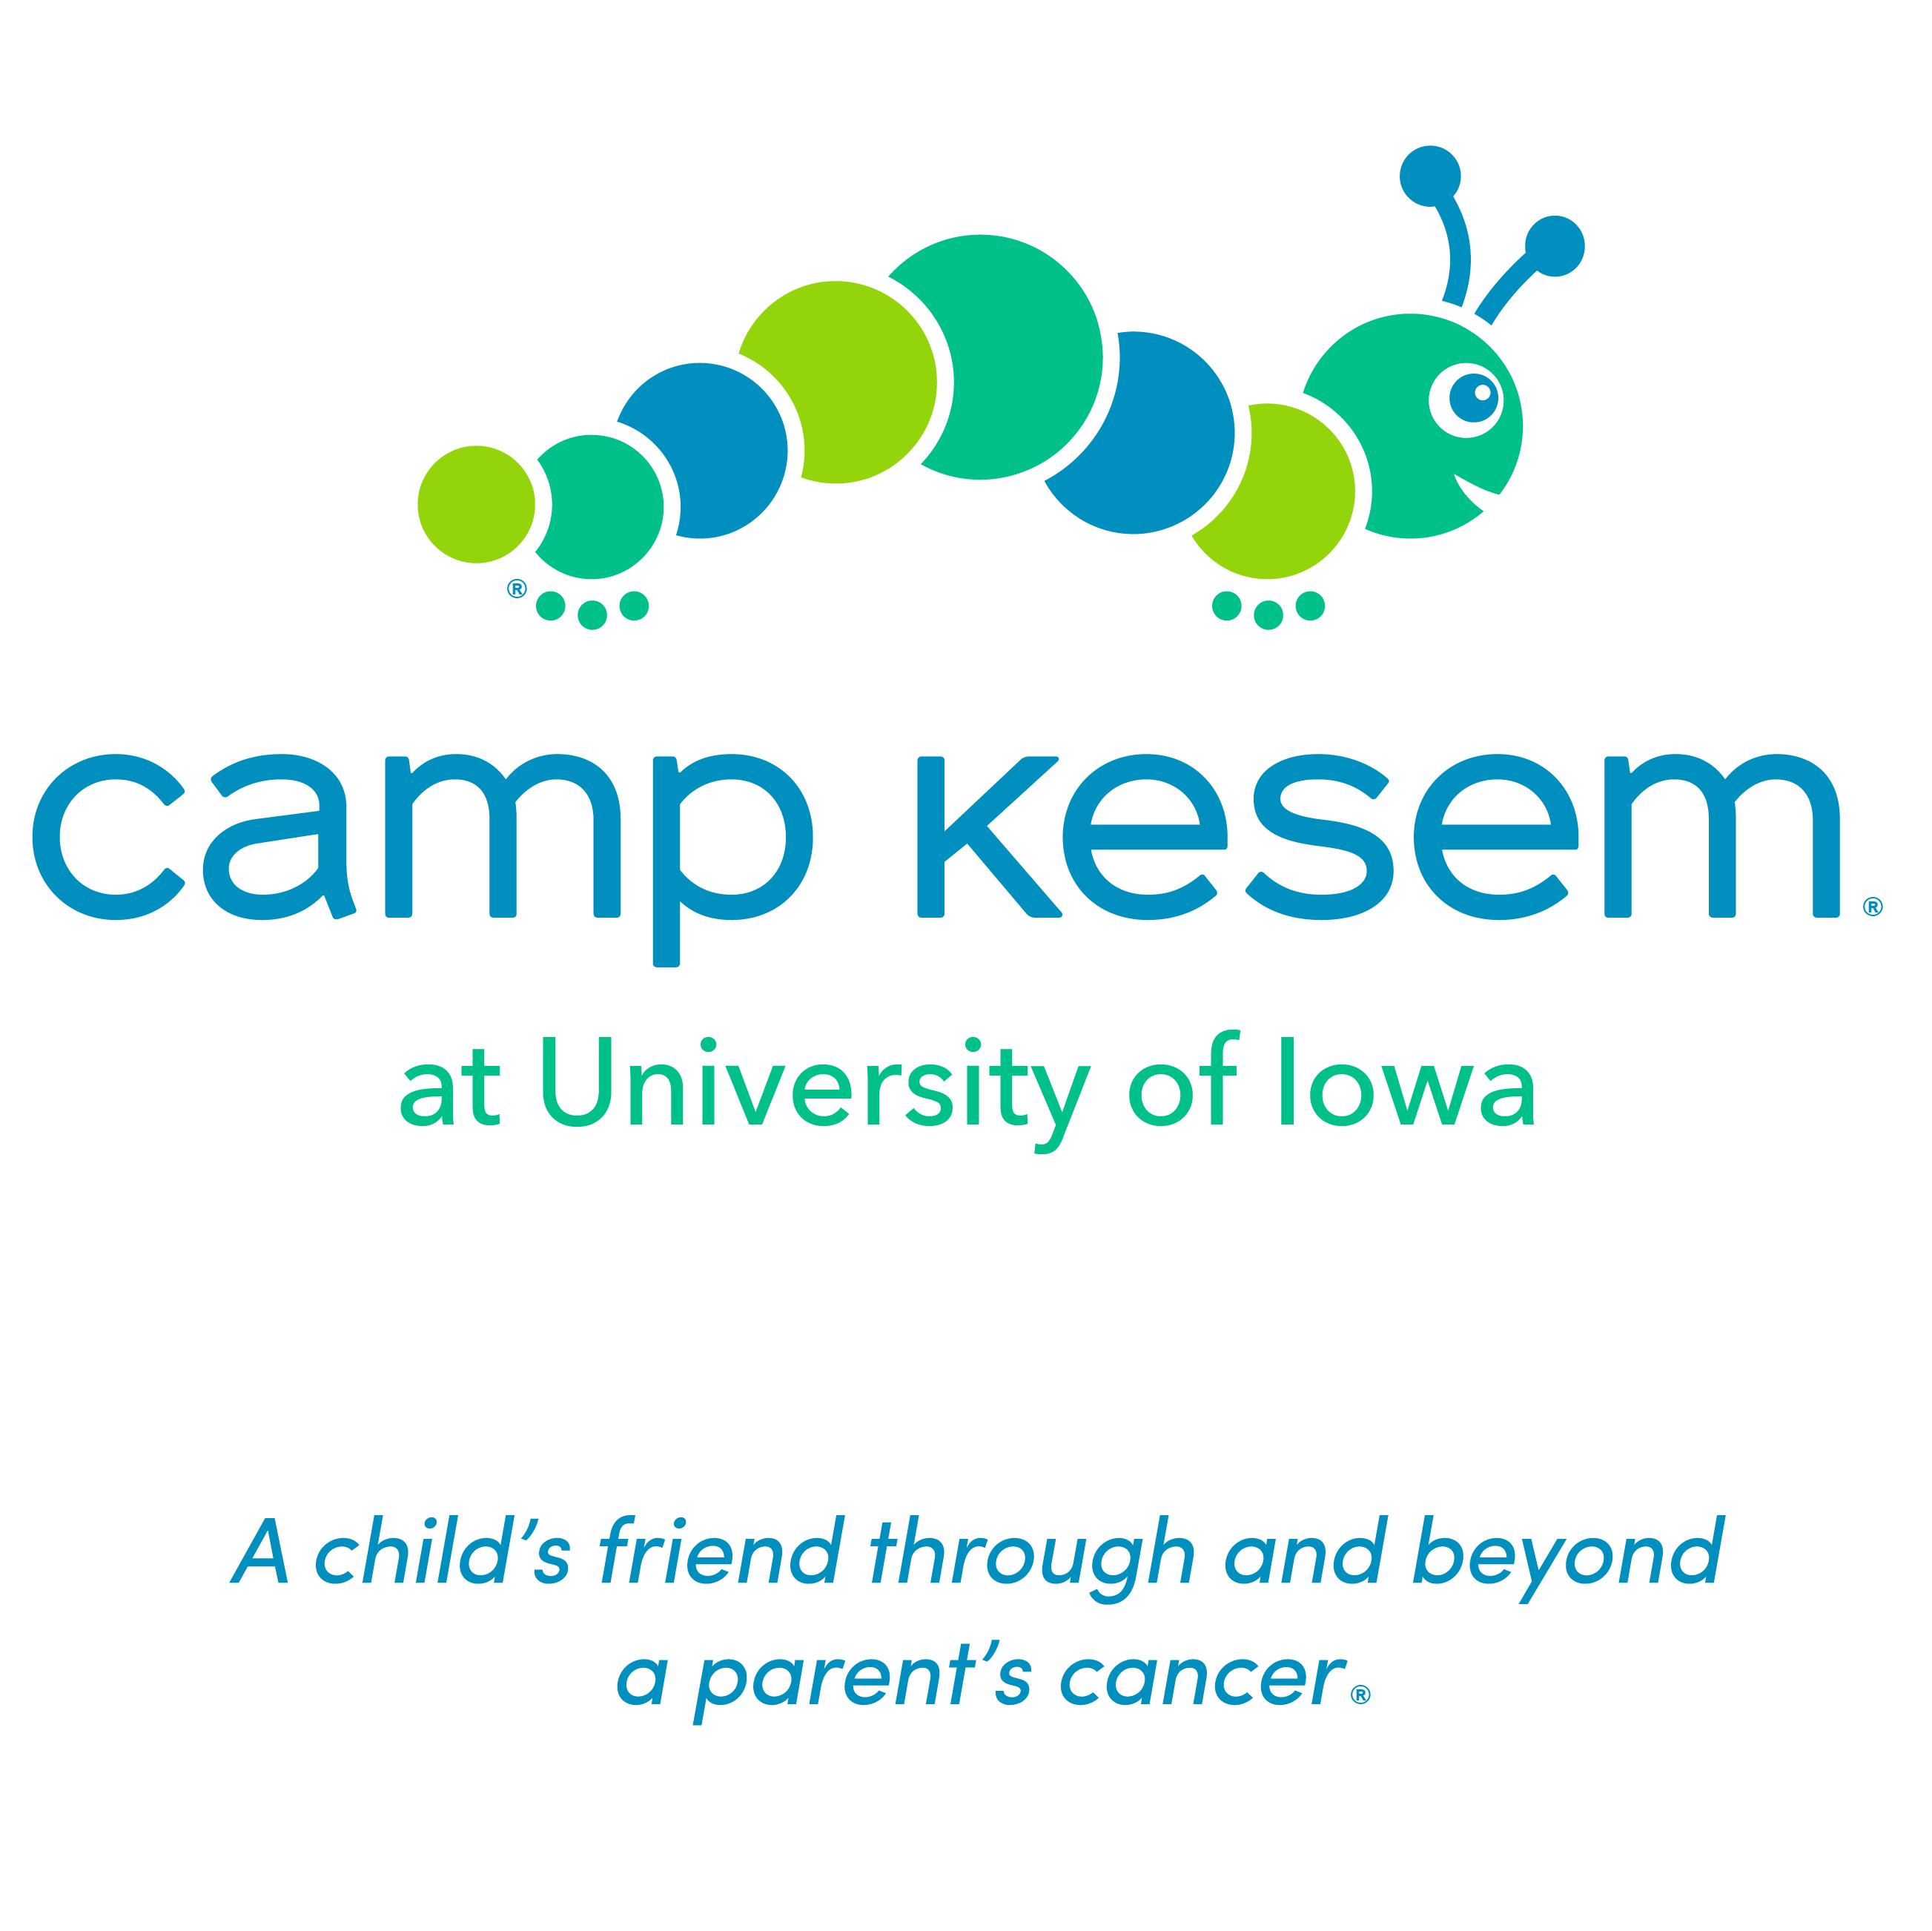 Camp Kesem at University of Iowa